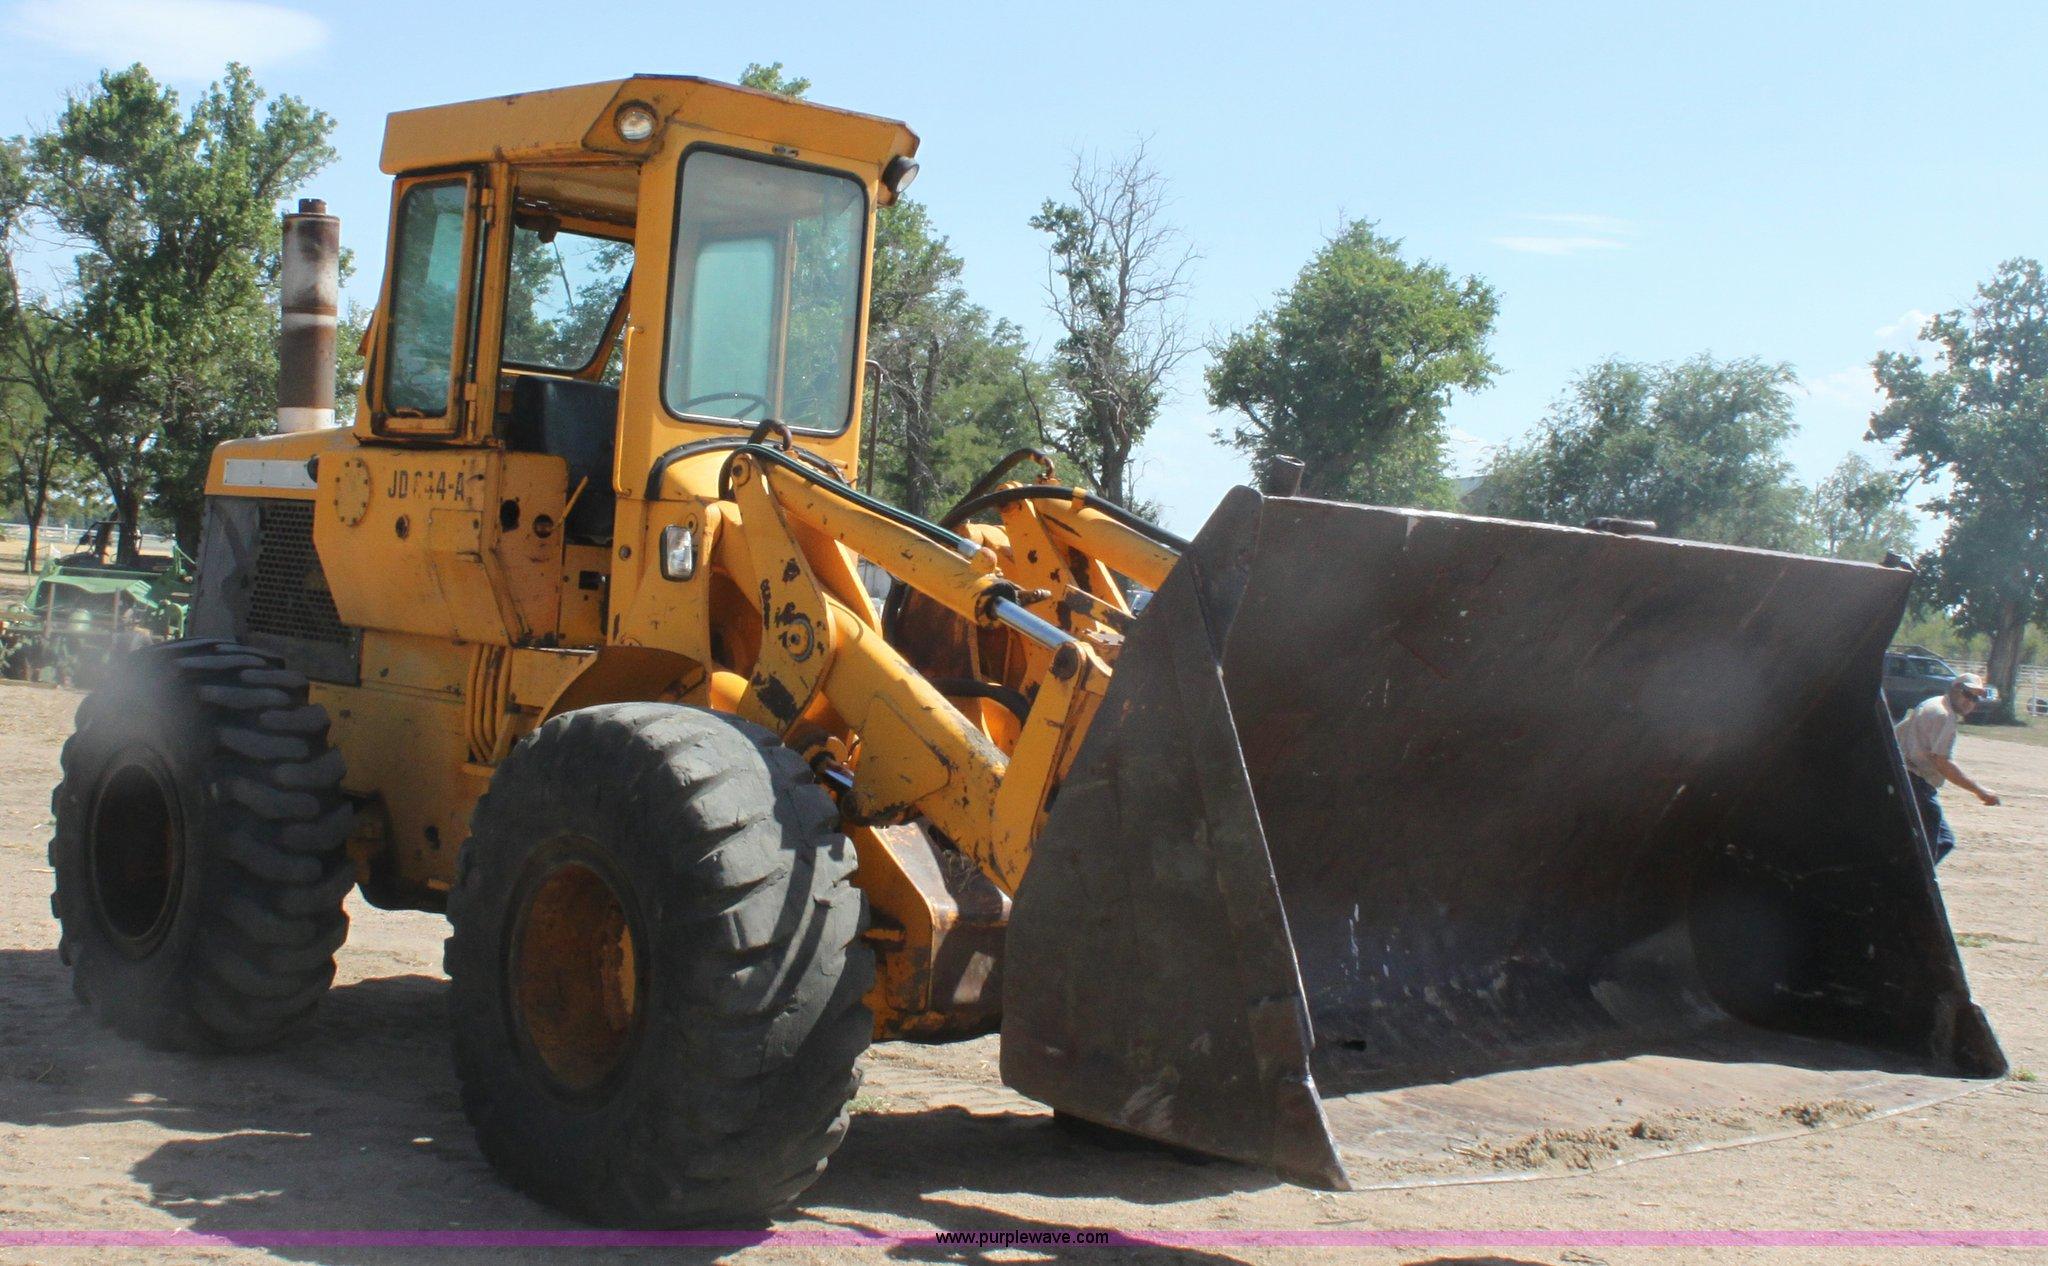 B7392 image for item B7392 1971 John Deere 644A wheel loader